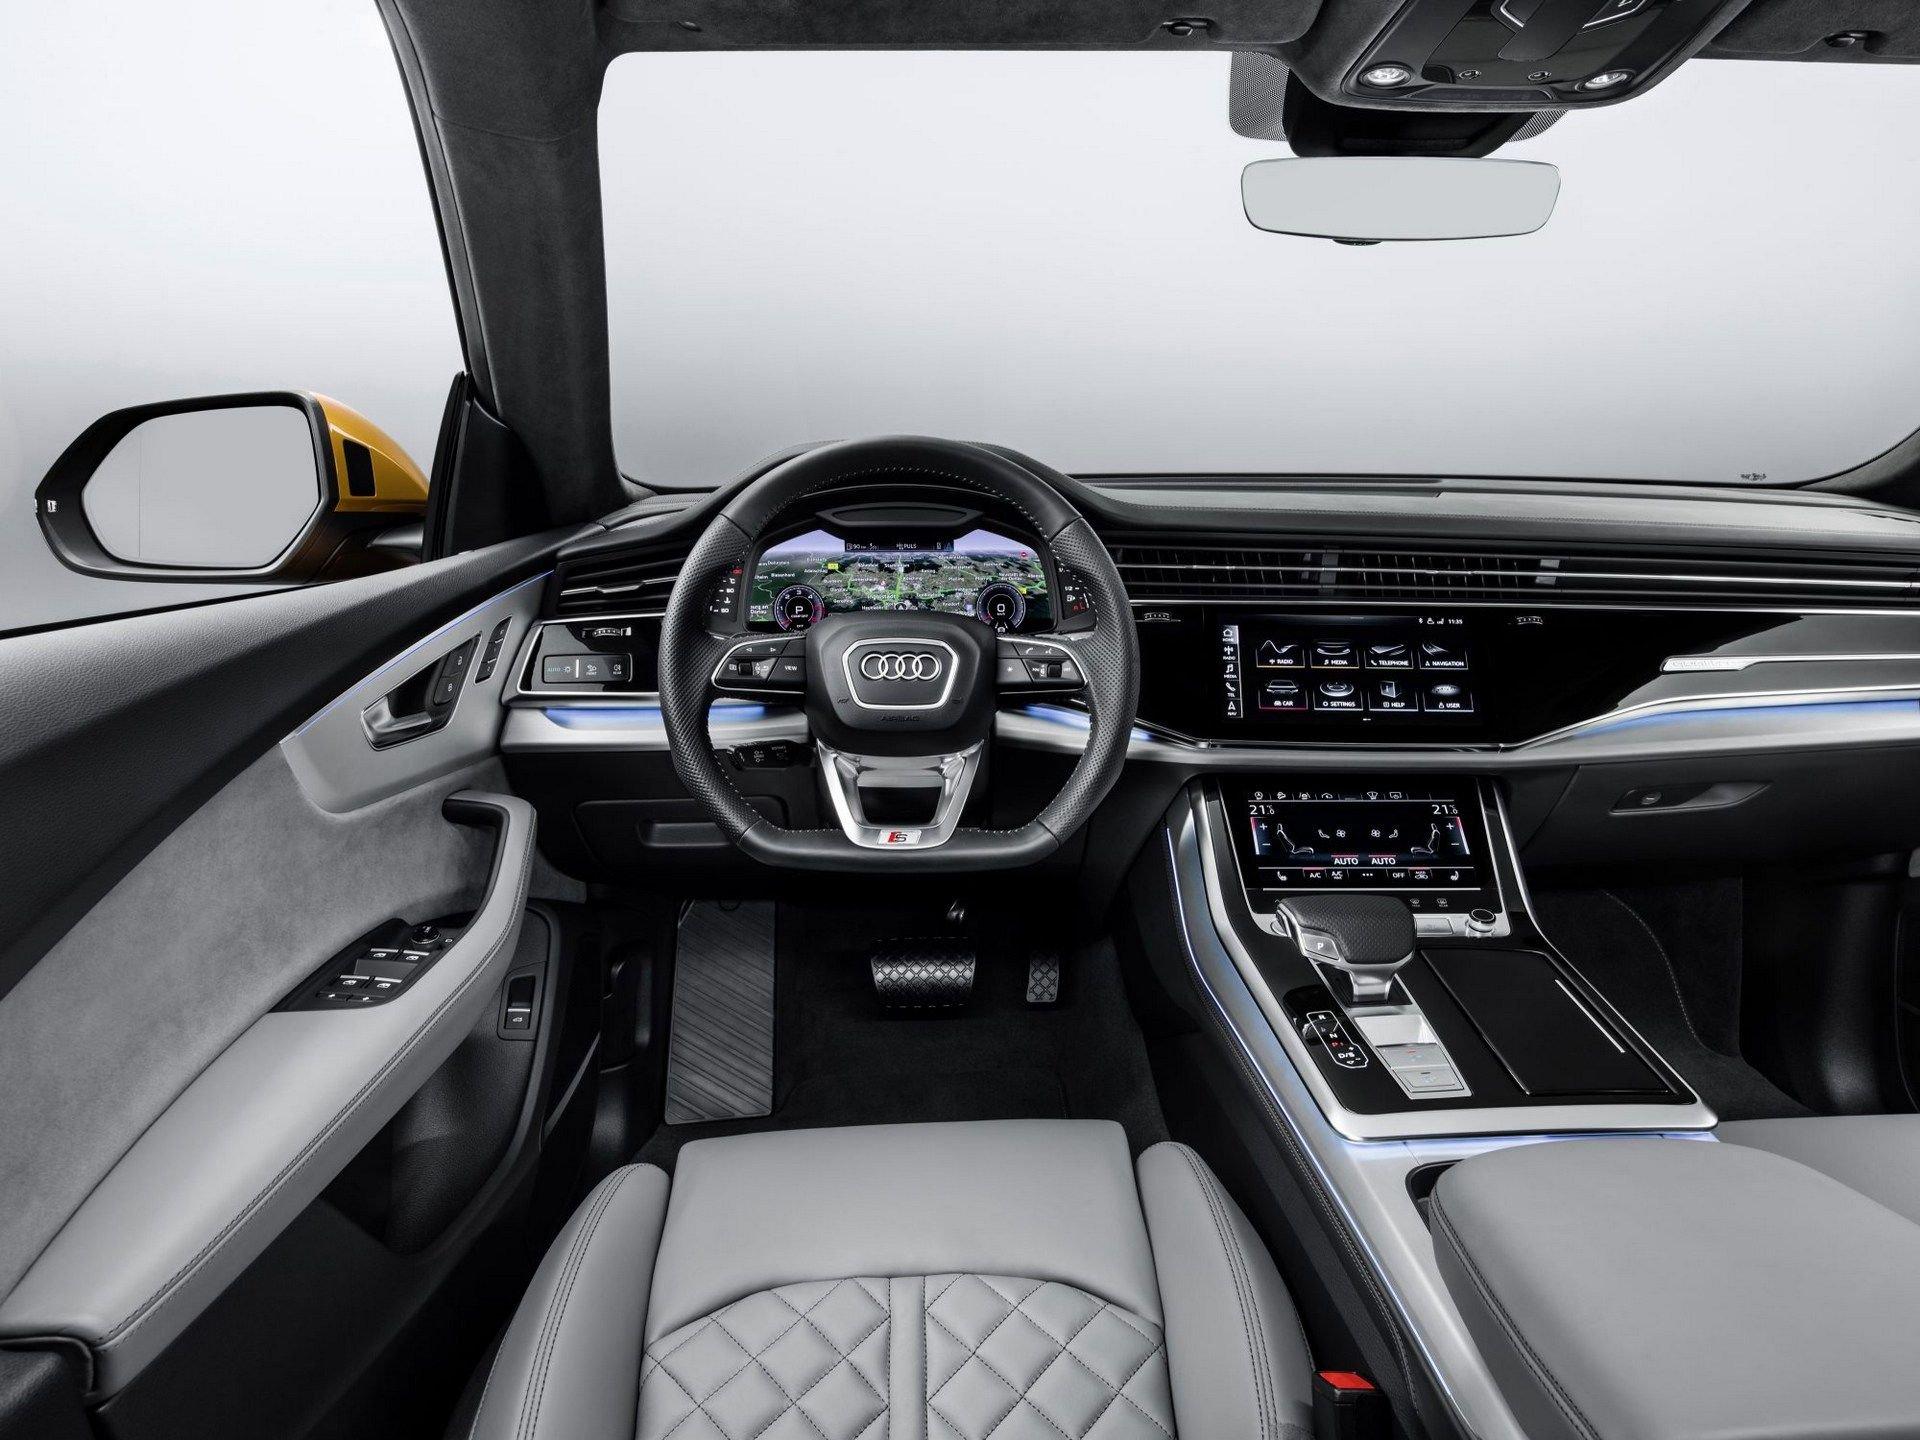 Audi Q8 2018 First Photos (12)